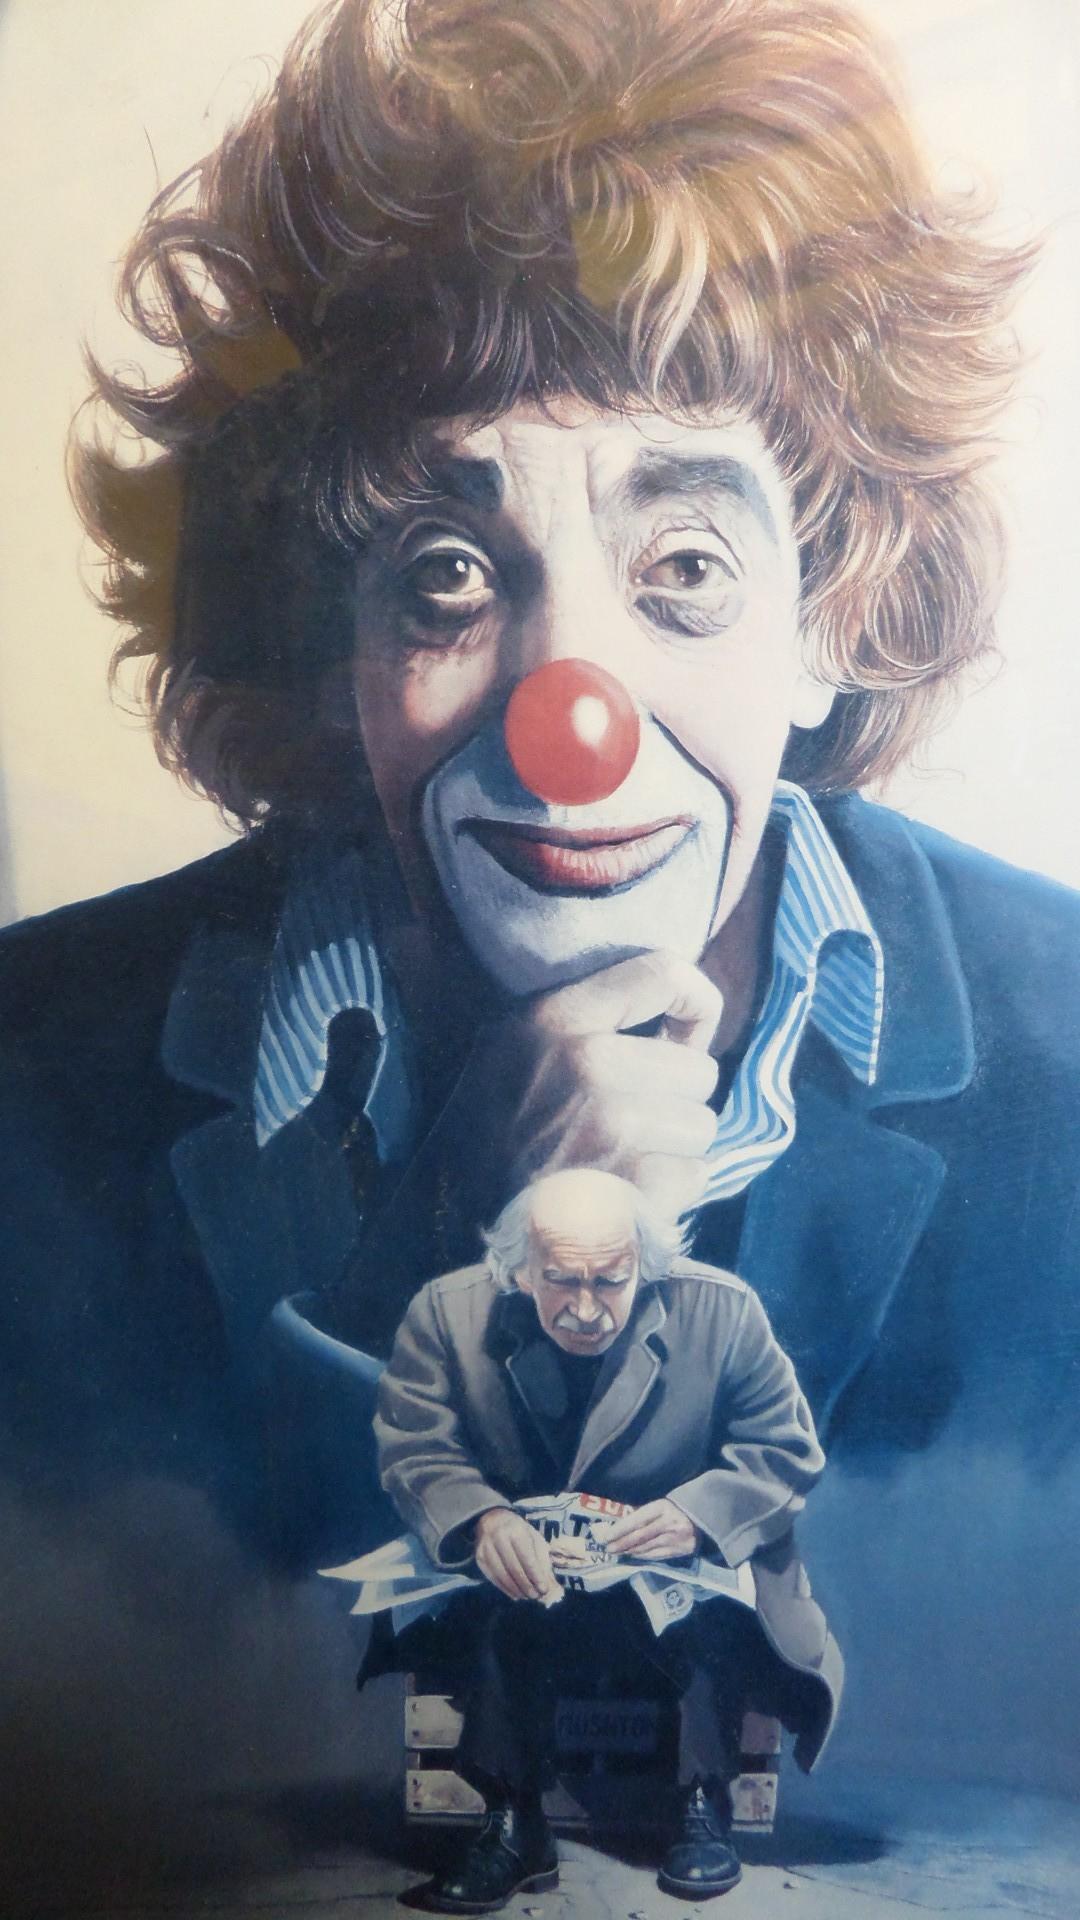 Clown screensaver wallpaper